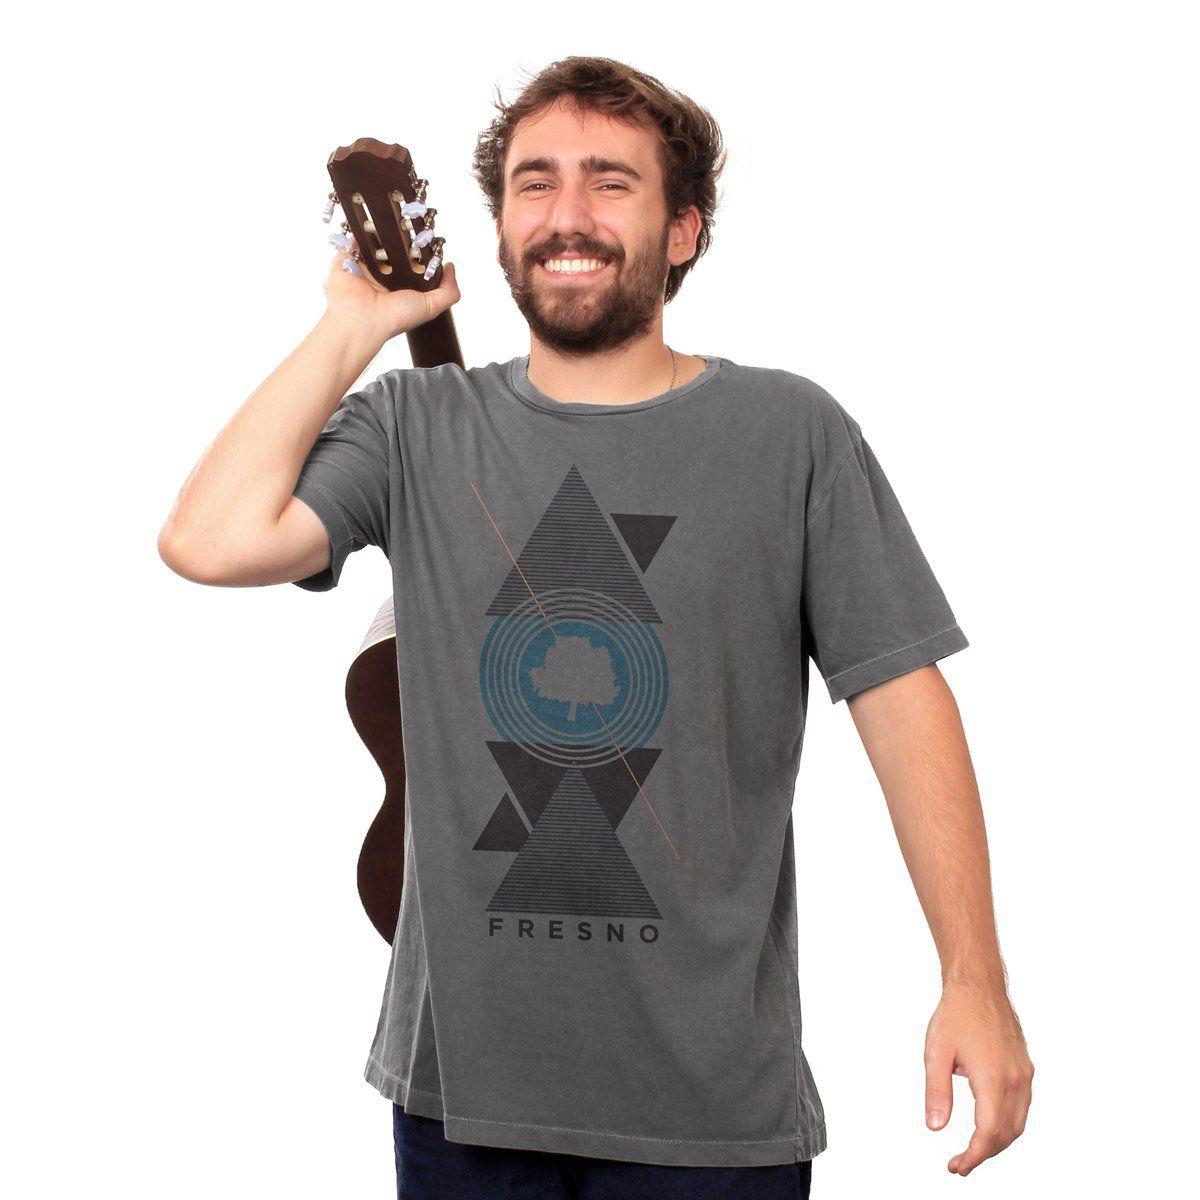 T-shirt Premium Masculina Fresno Geometric